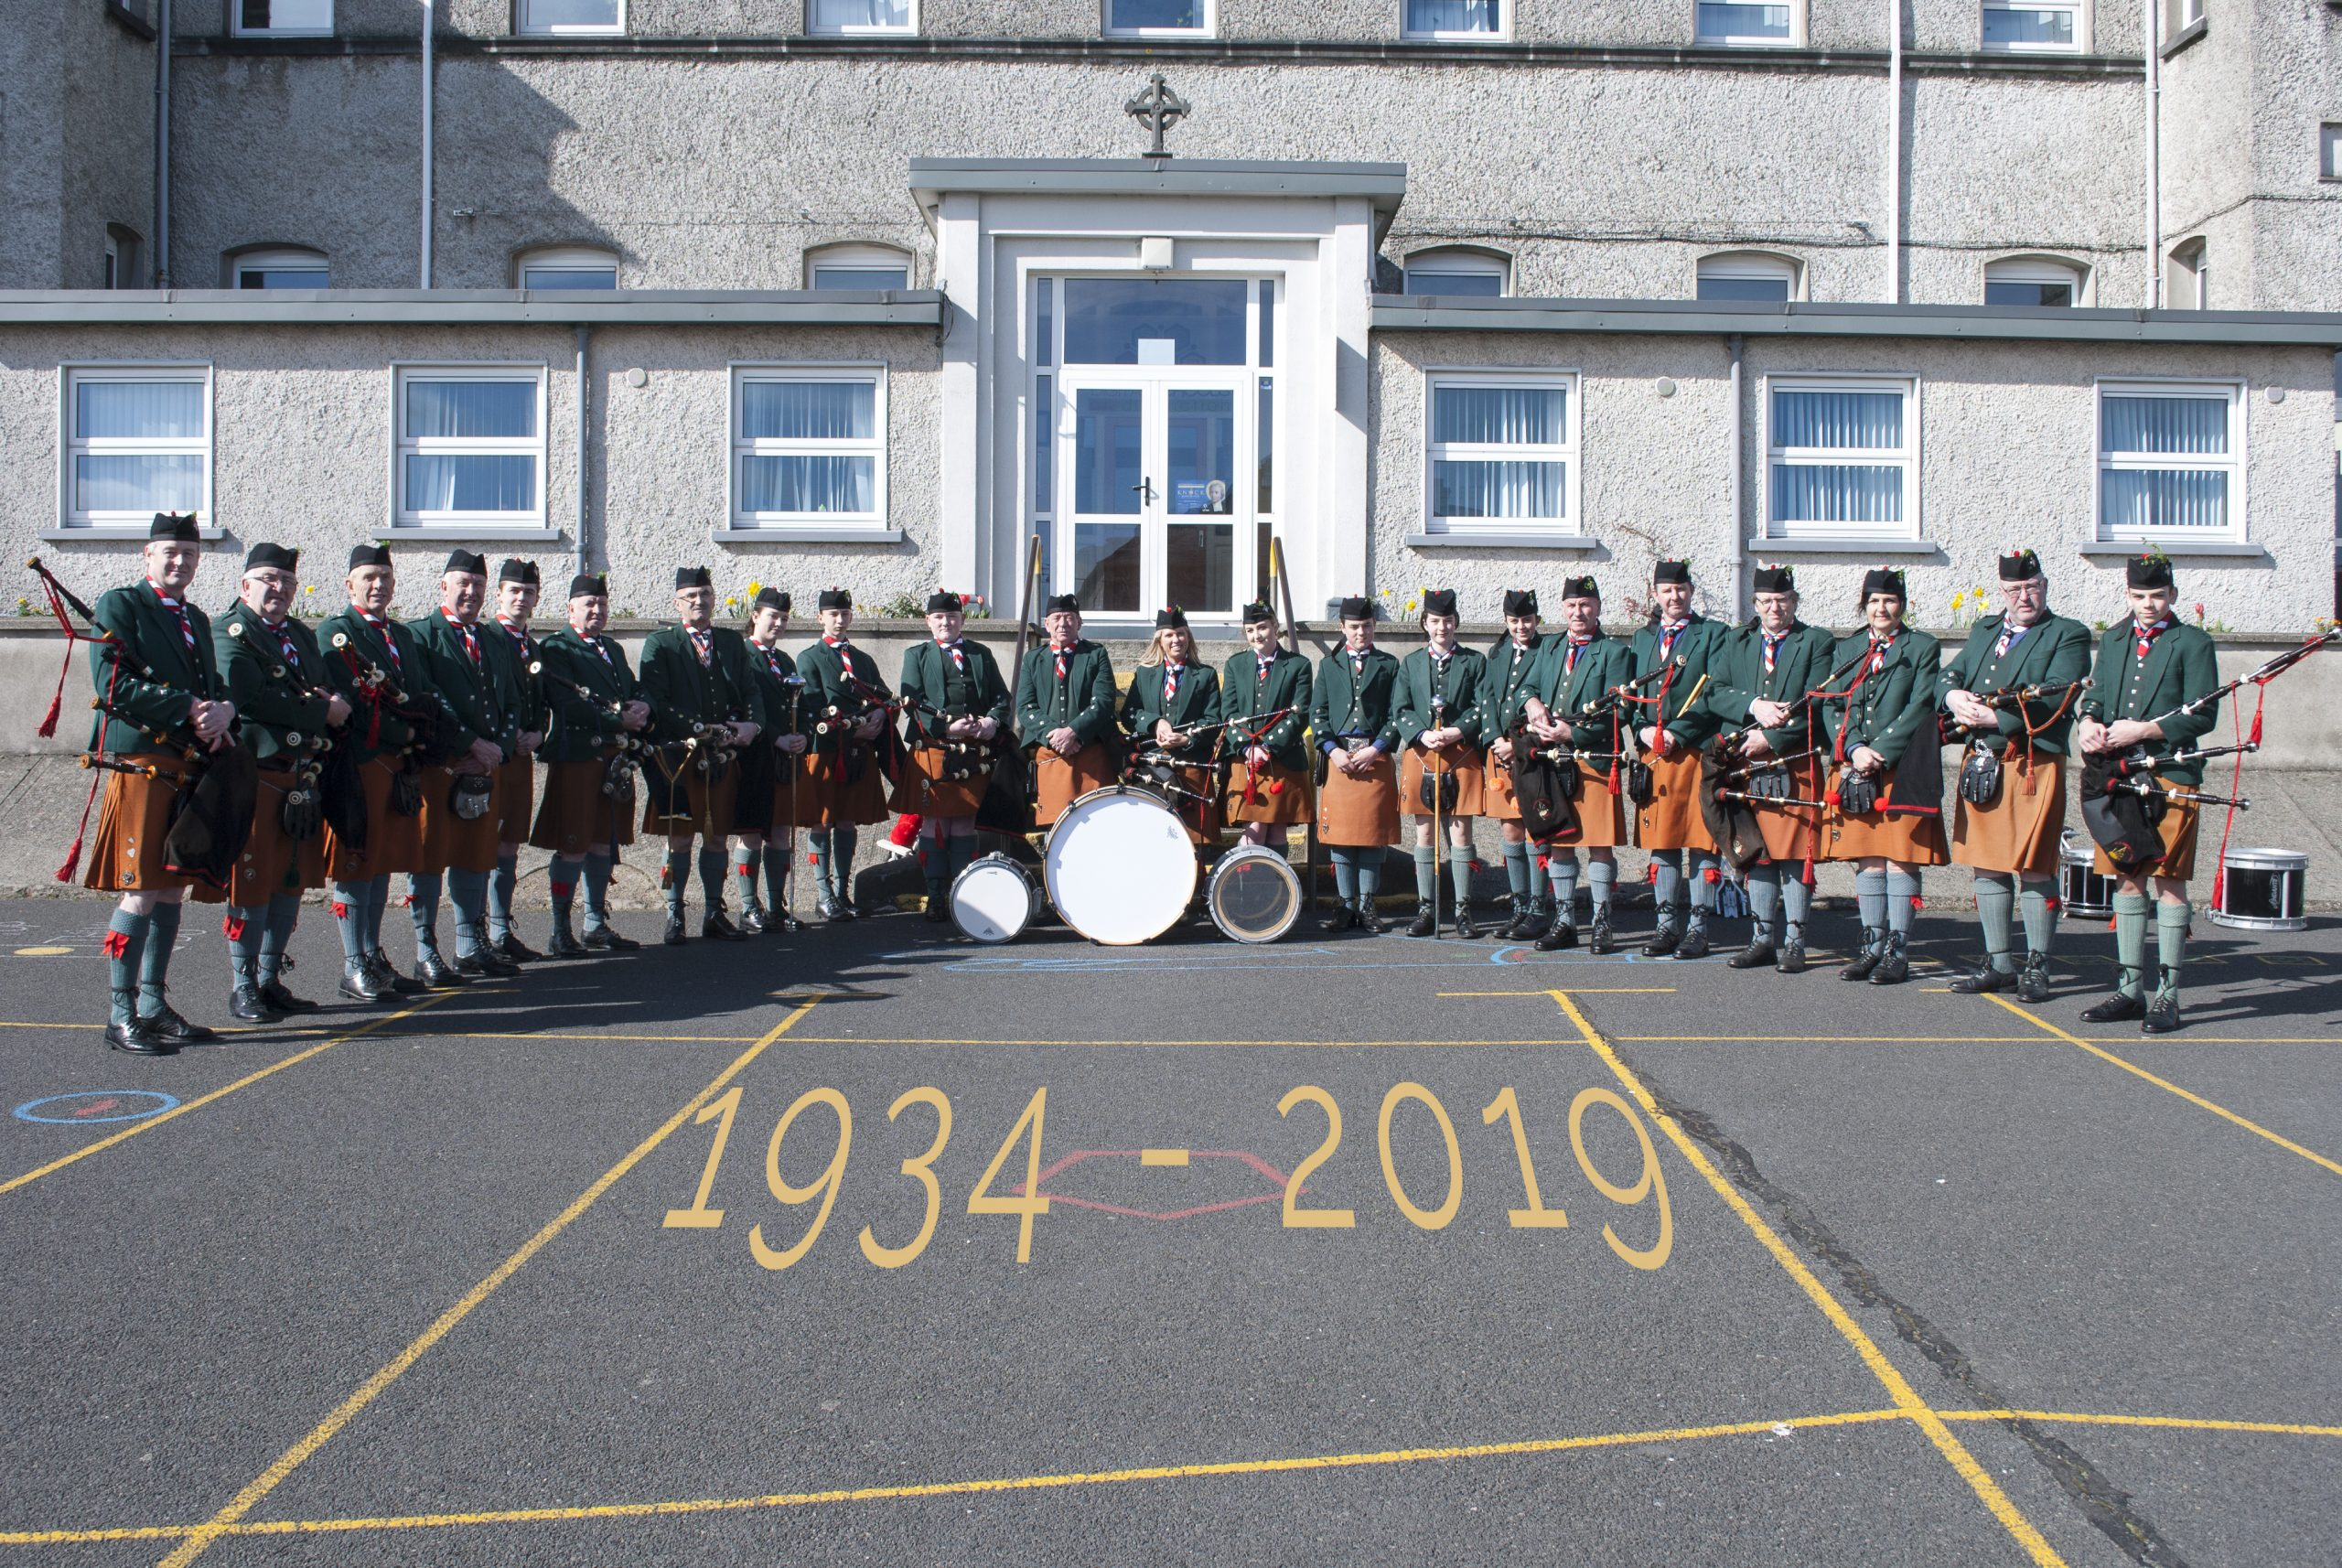 De La Salle Pipe Band Retrace Steps as They Celebrate 85th Anniversary